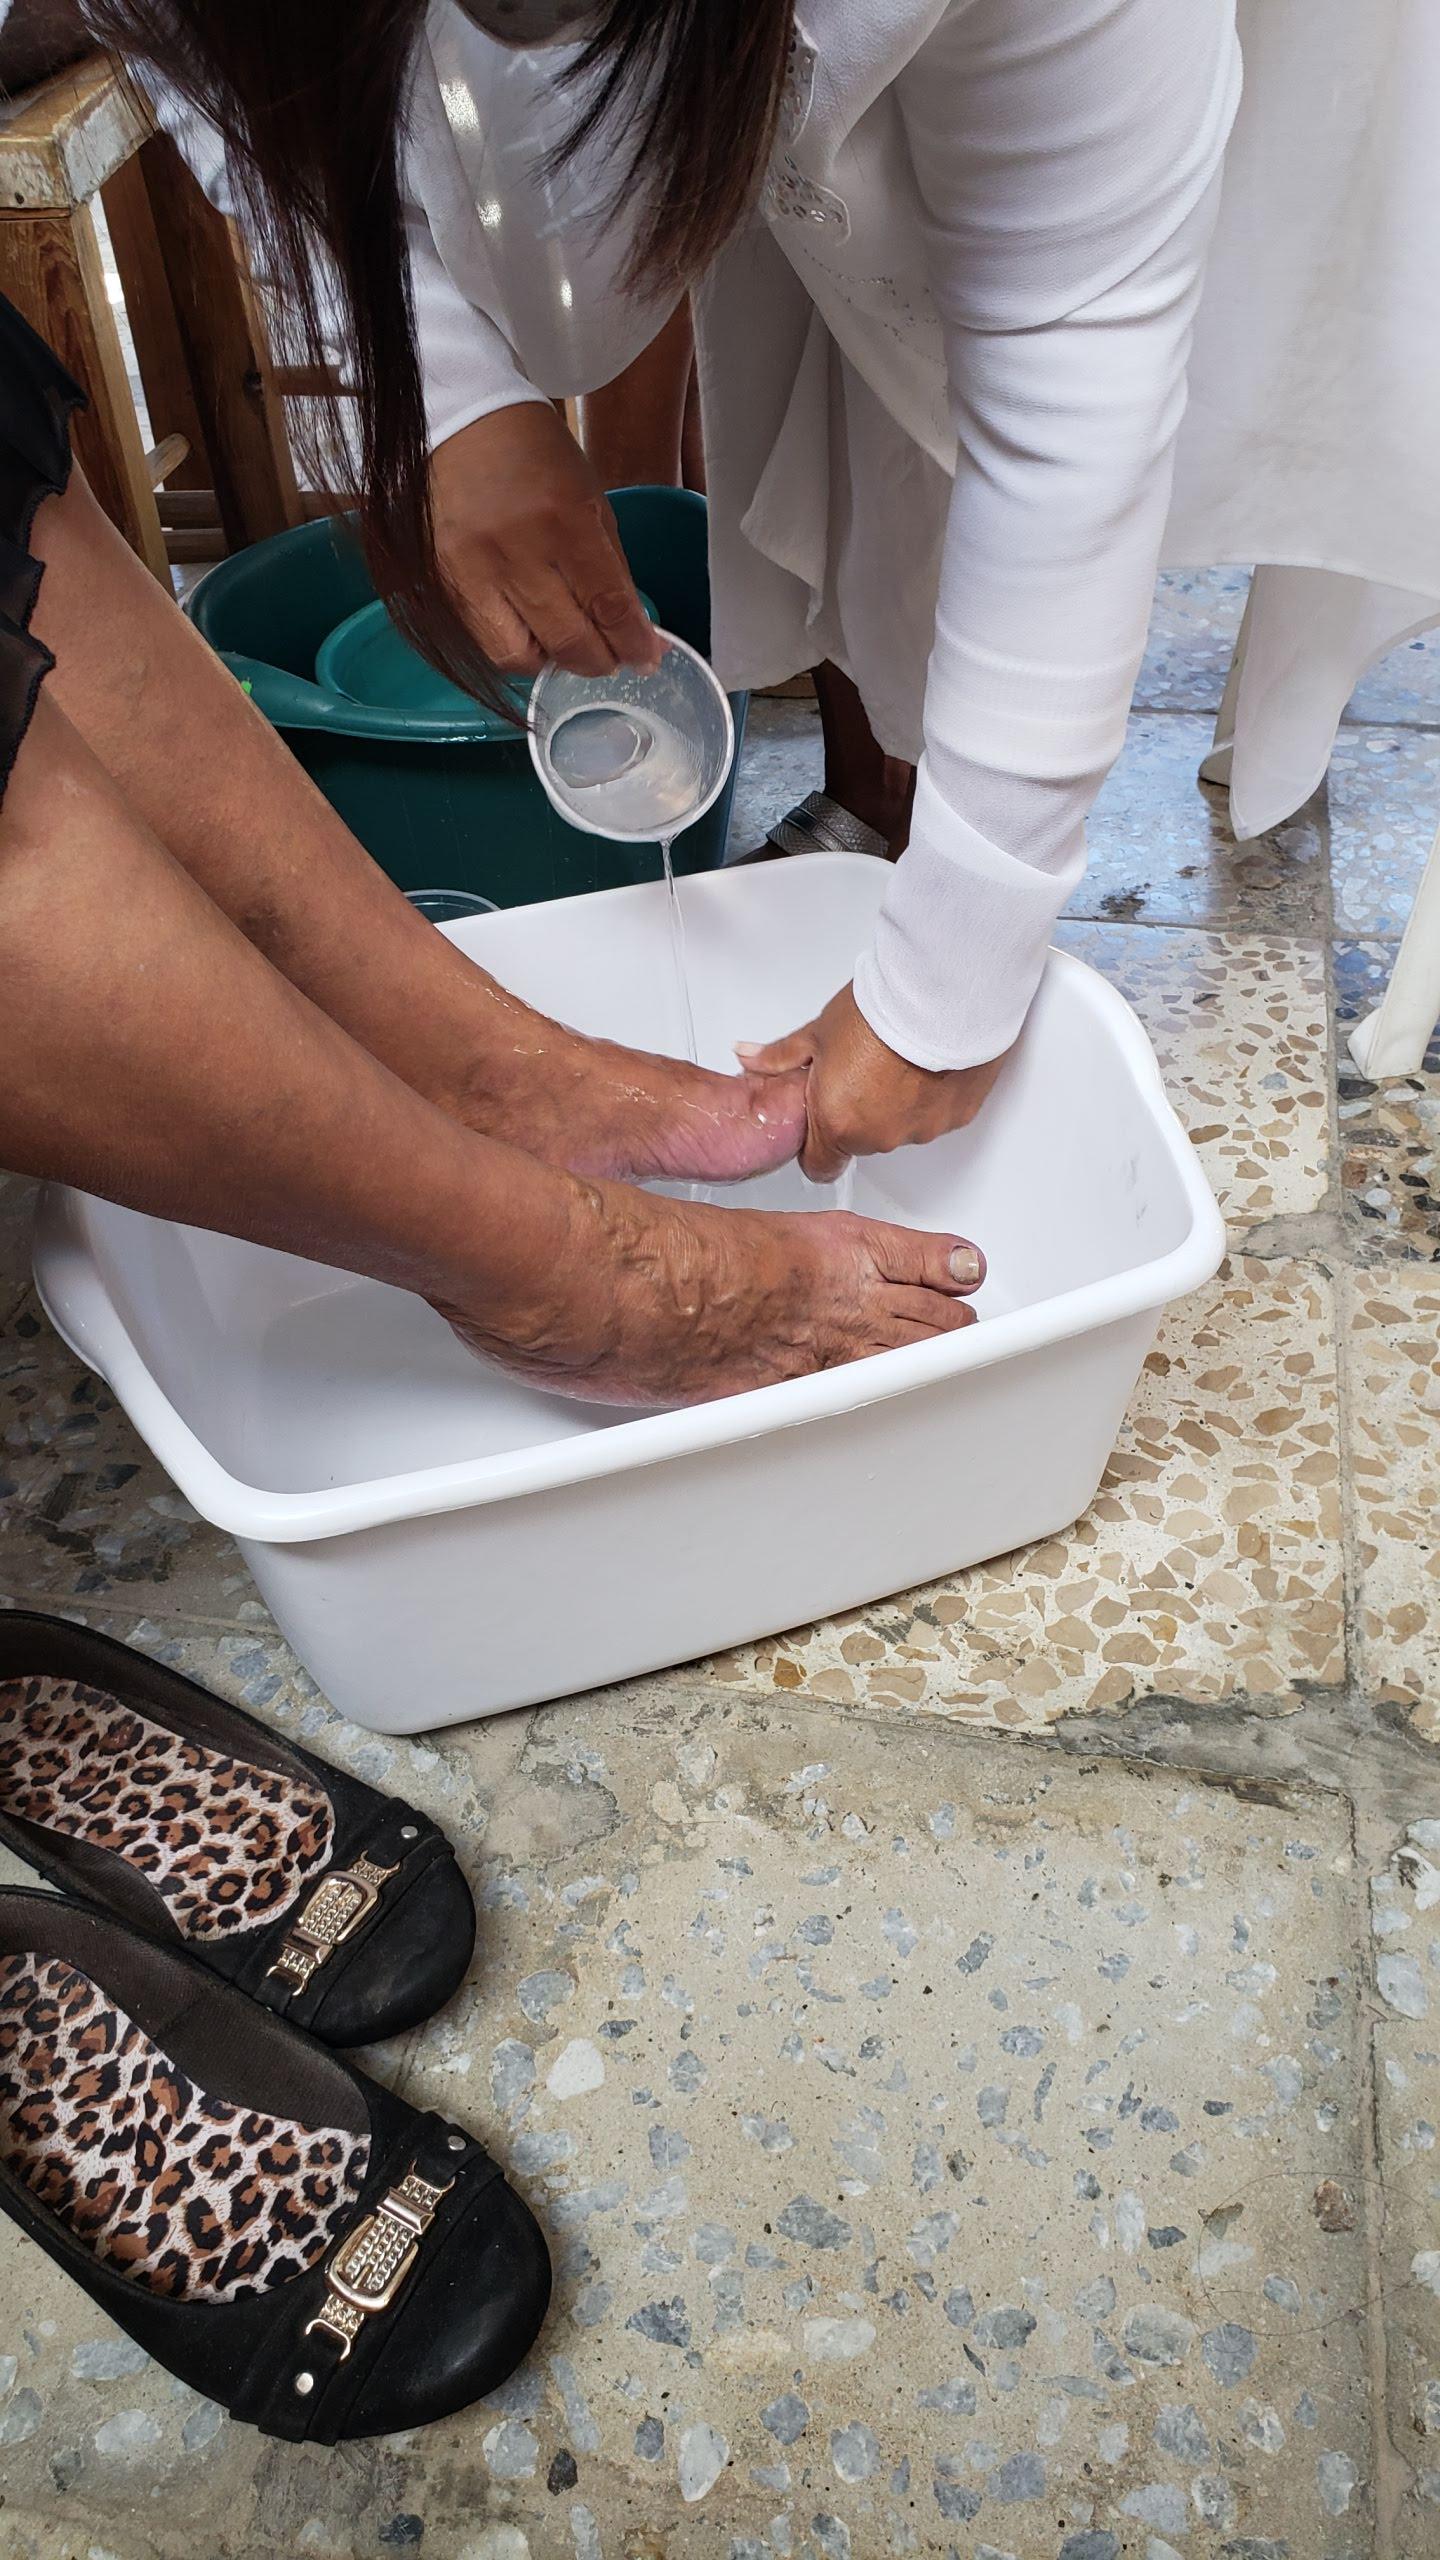 Women's retreat leaders washed the feet of participants at Centro de Retiros Villa de Gracia in January.